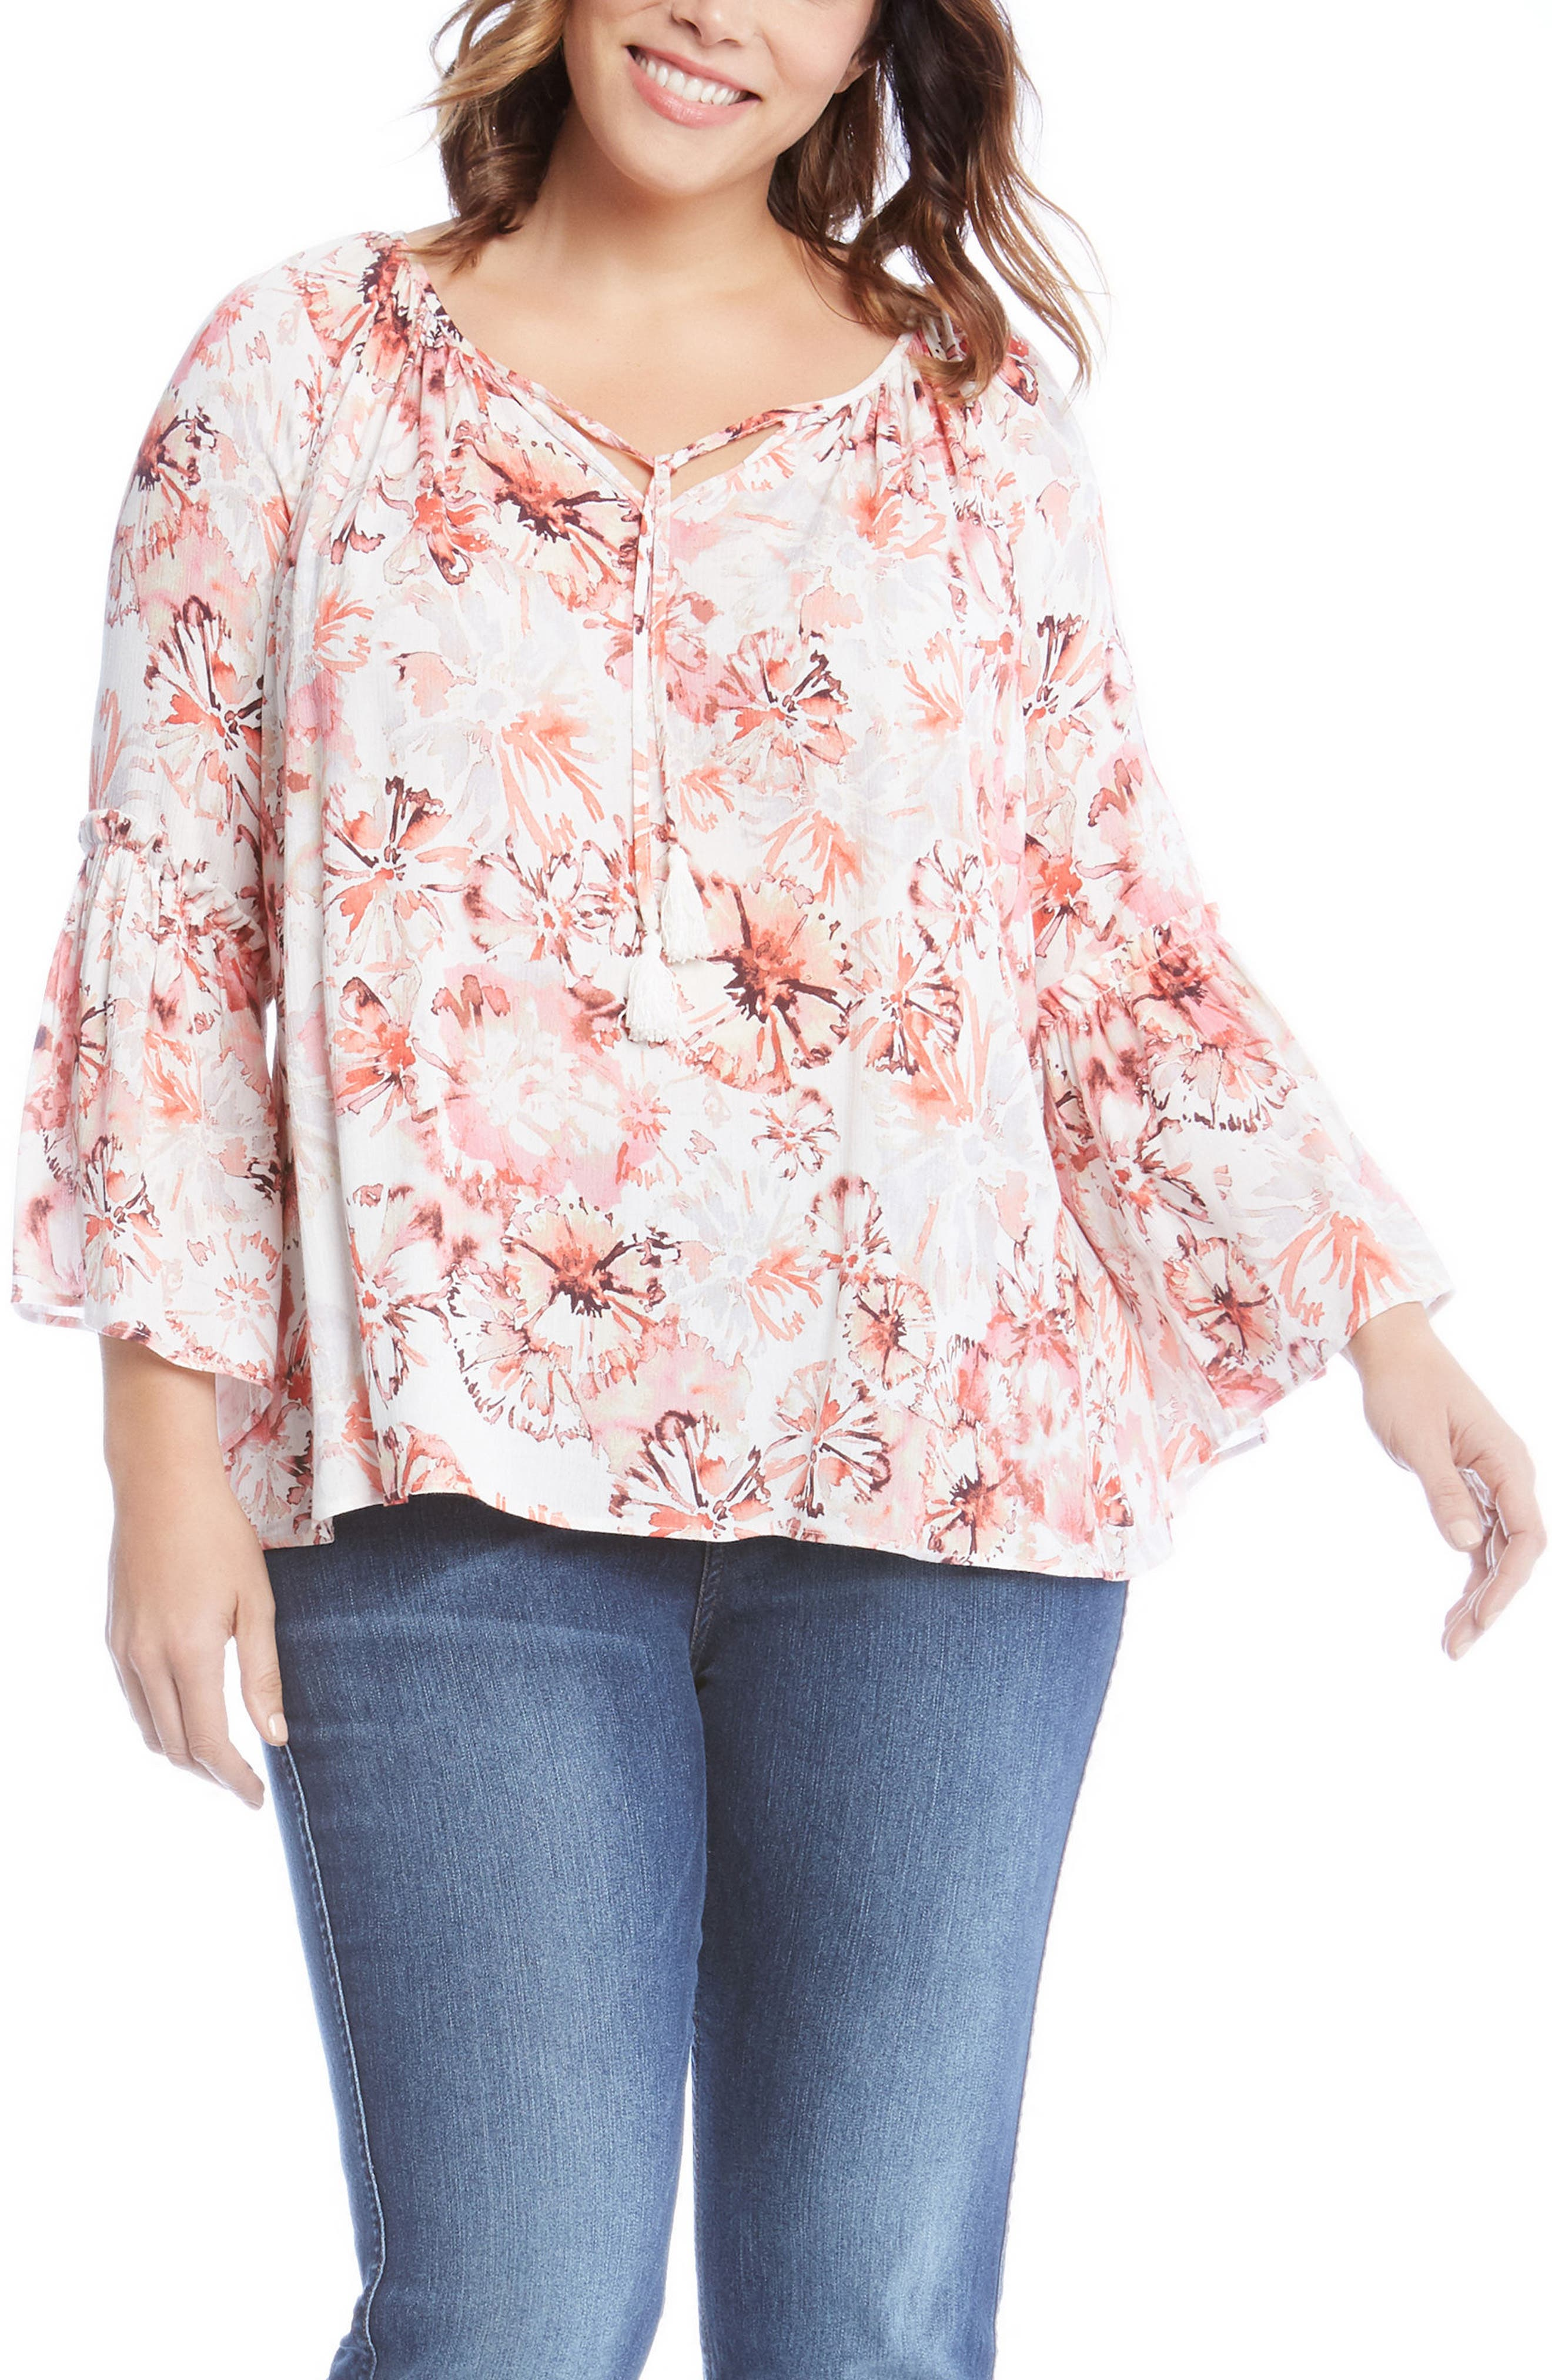 Ruffle Sleeve Top,                         Main,                         color, Rose